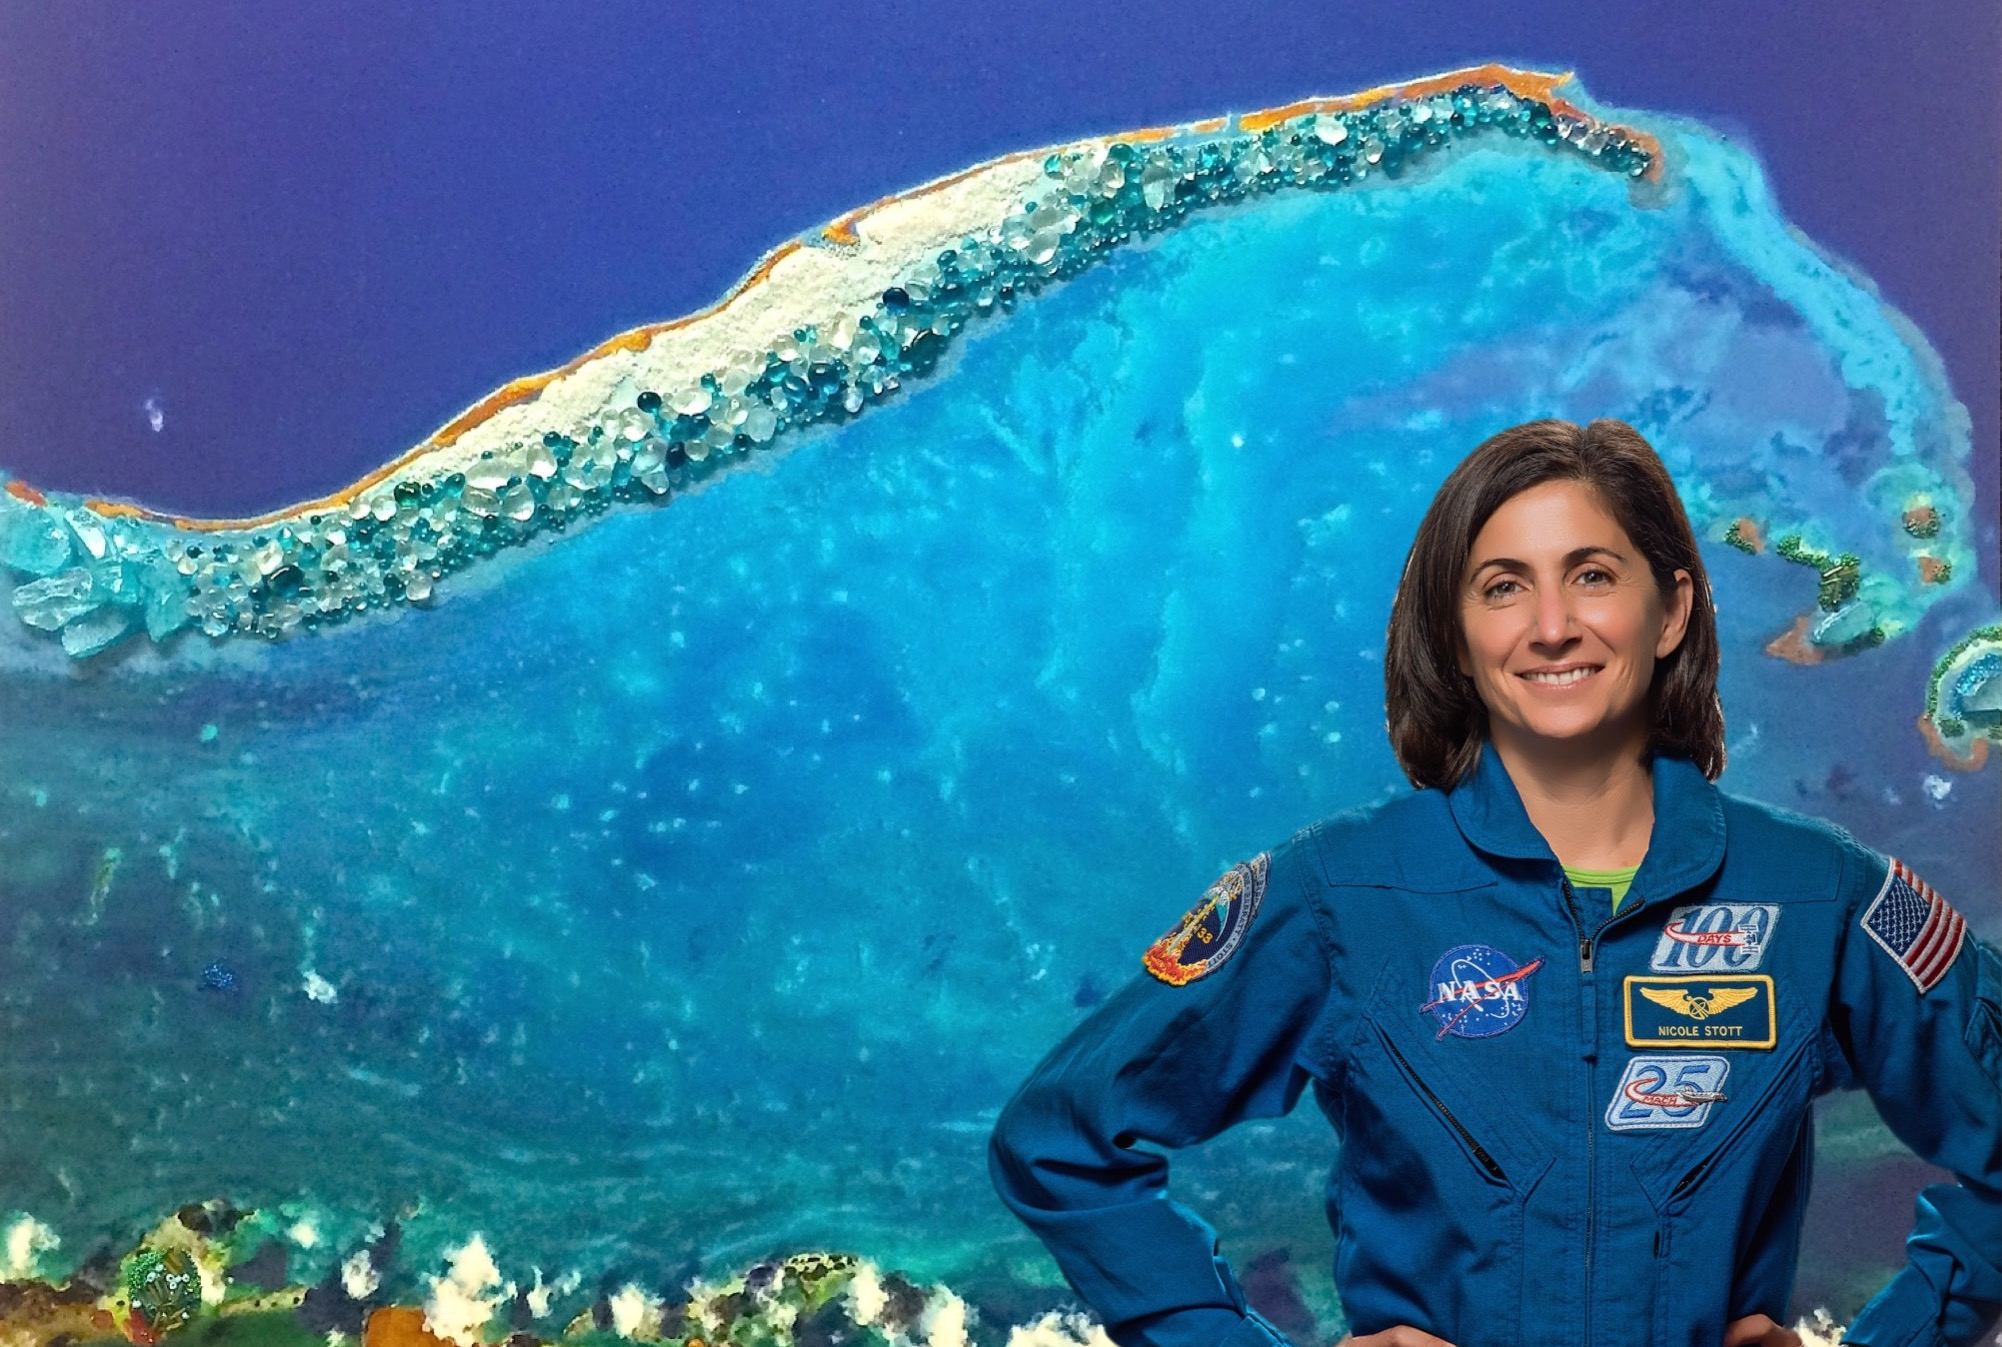 Astronaut Nicole Stott NASA charity event